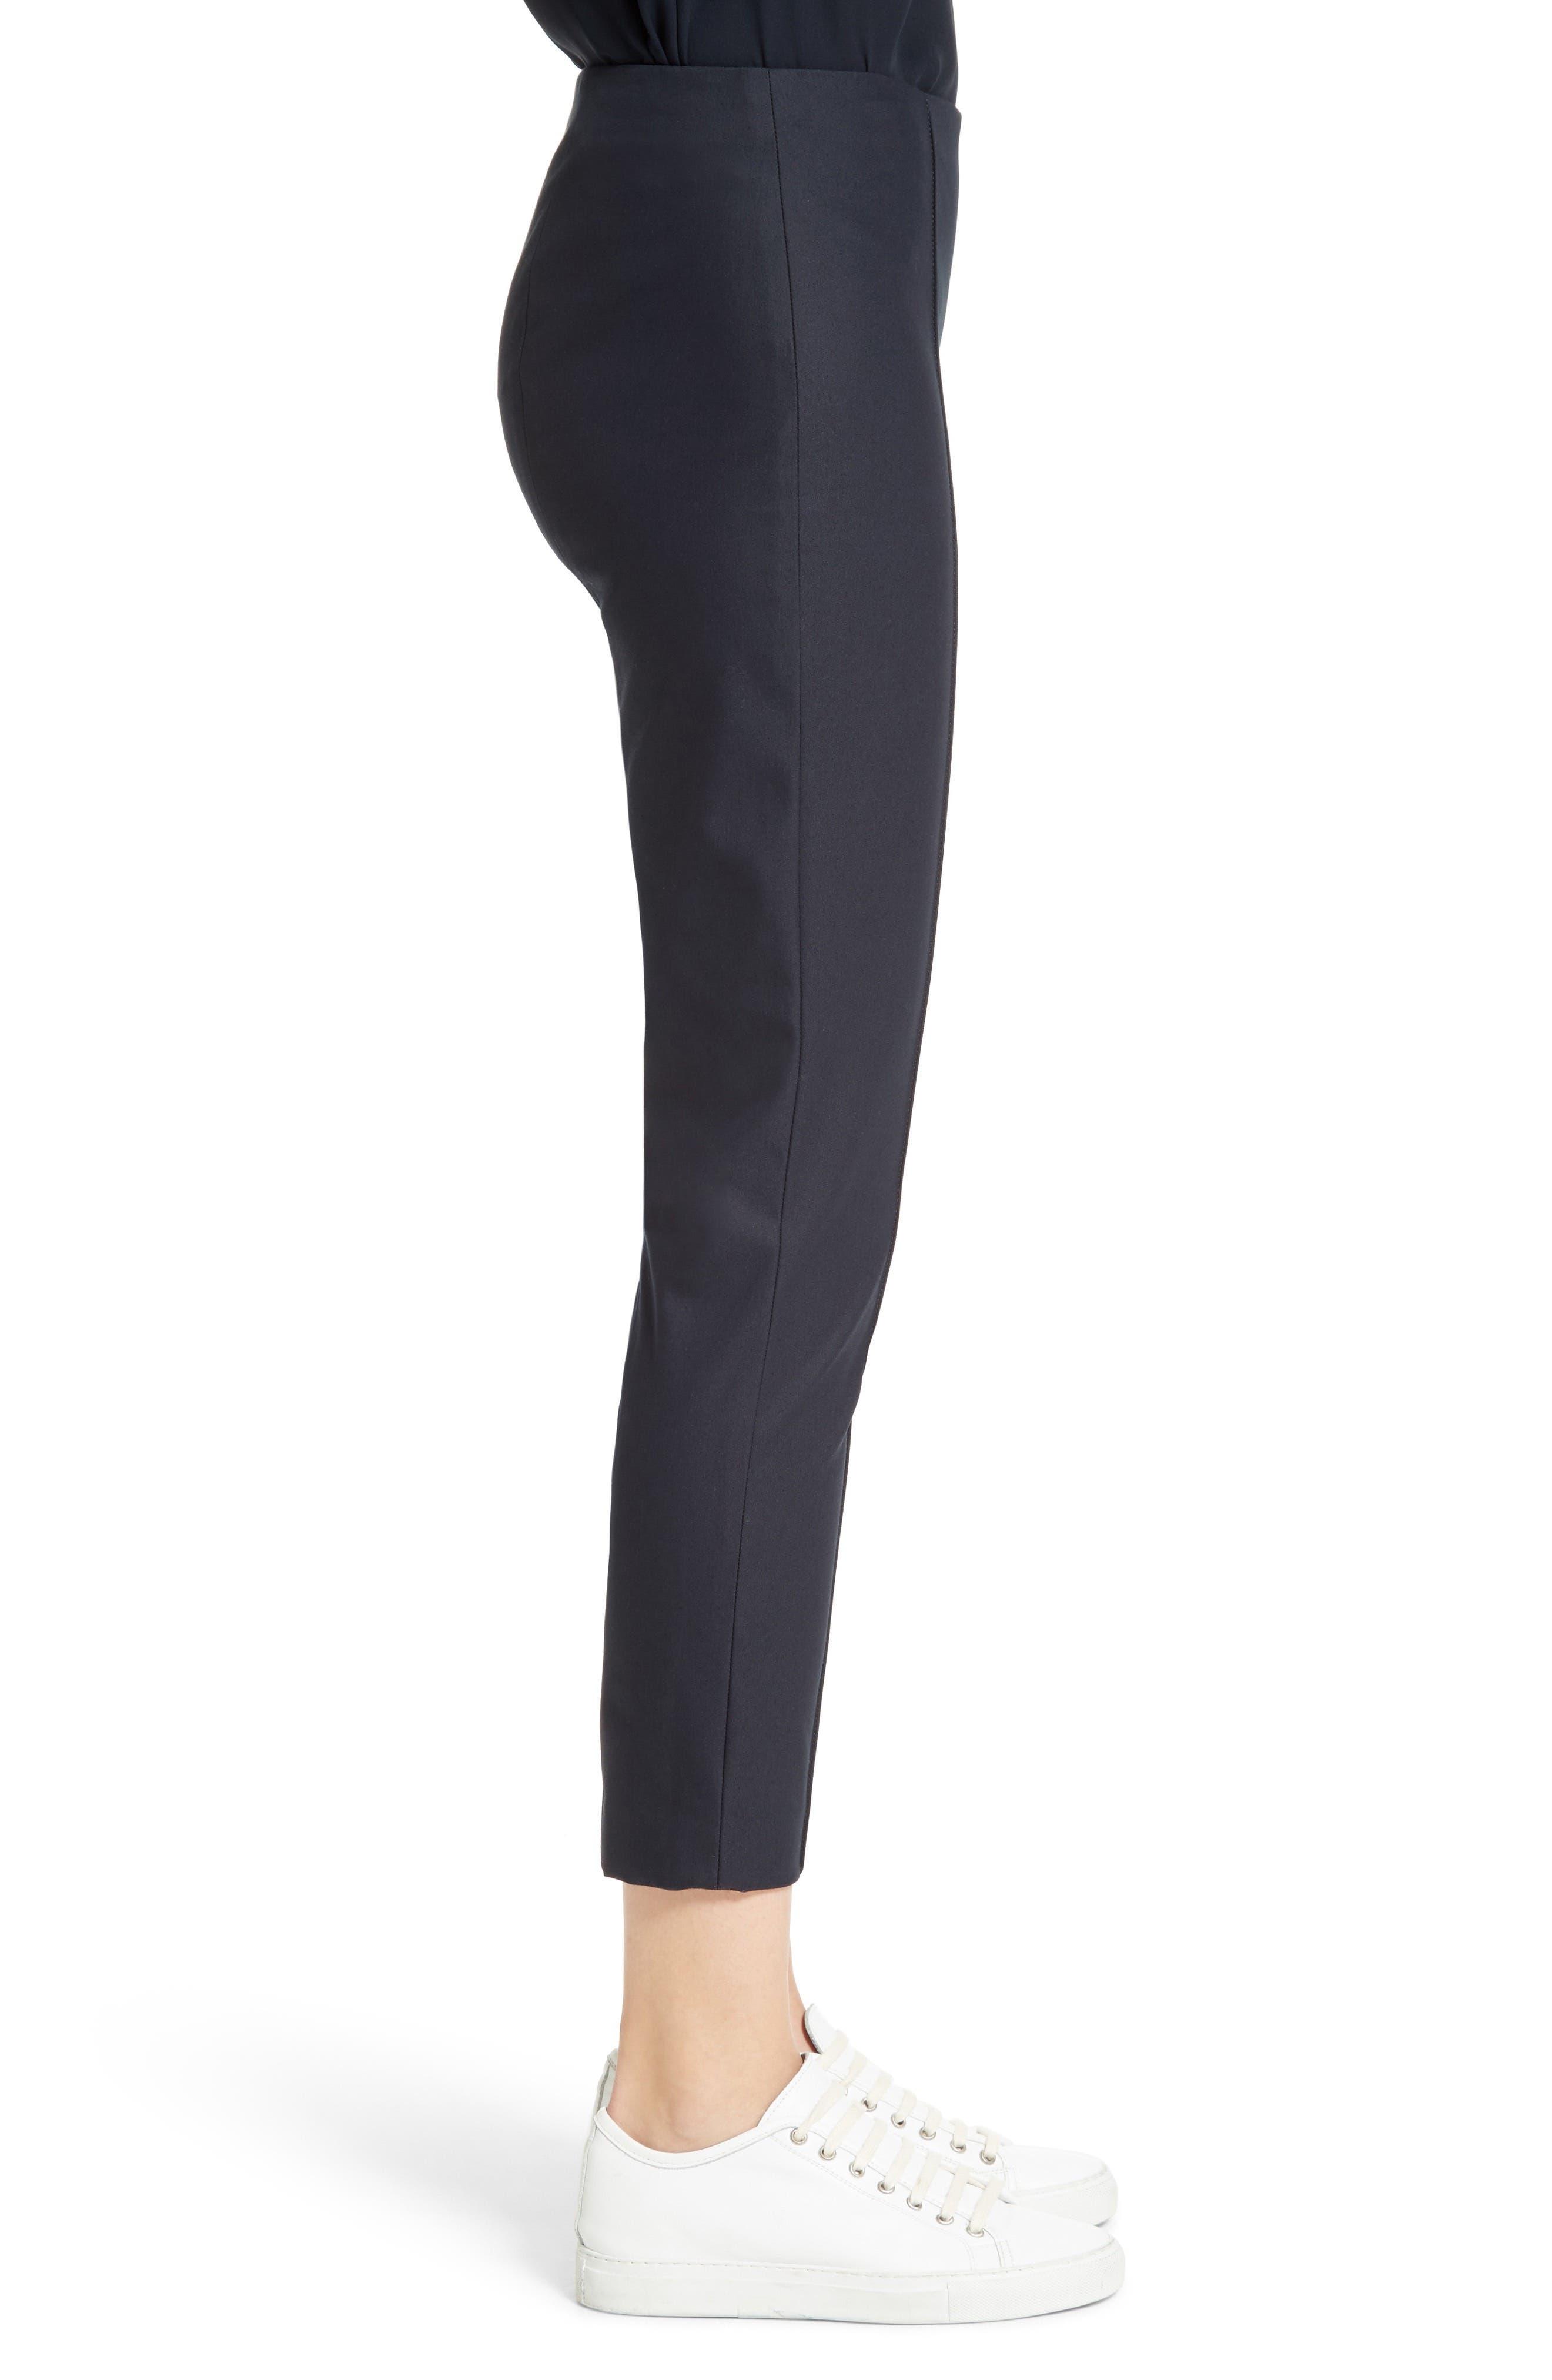 Alettah Stretch Skinny Pants,                             Alternate thumbnail 3, color,                             001